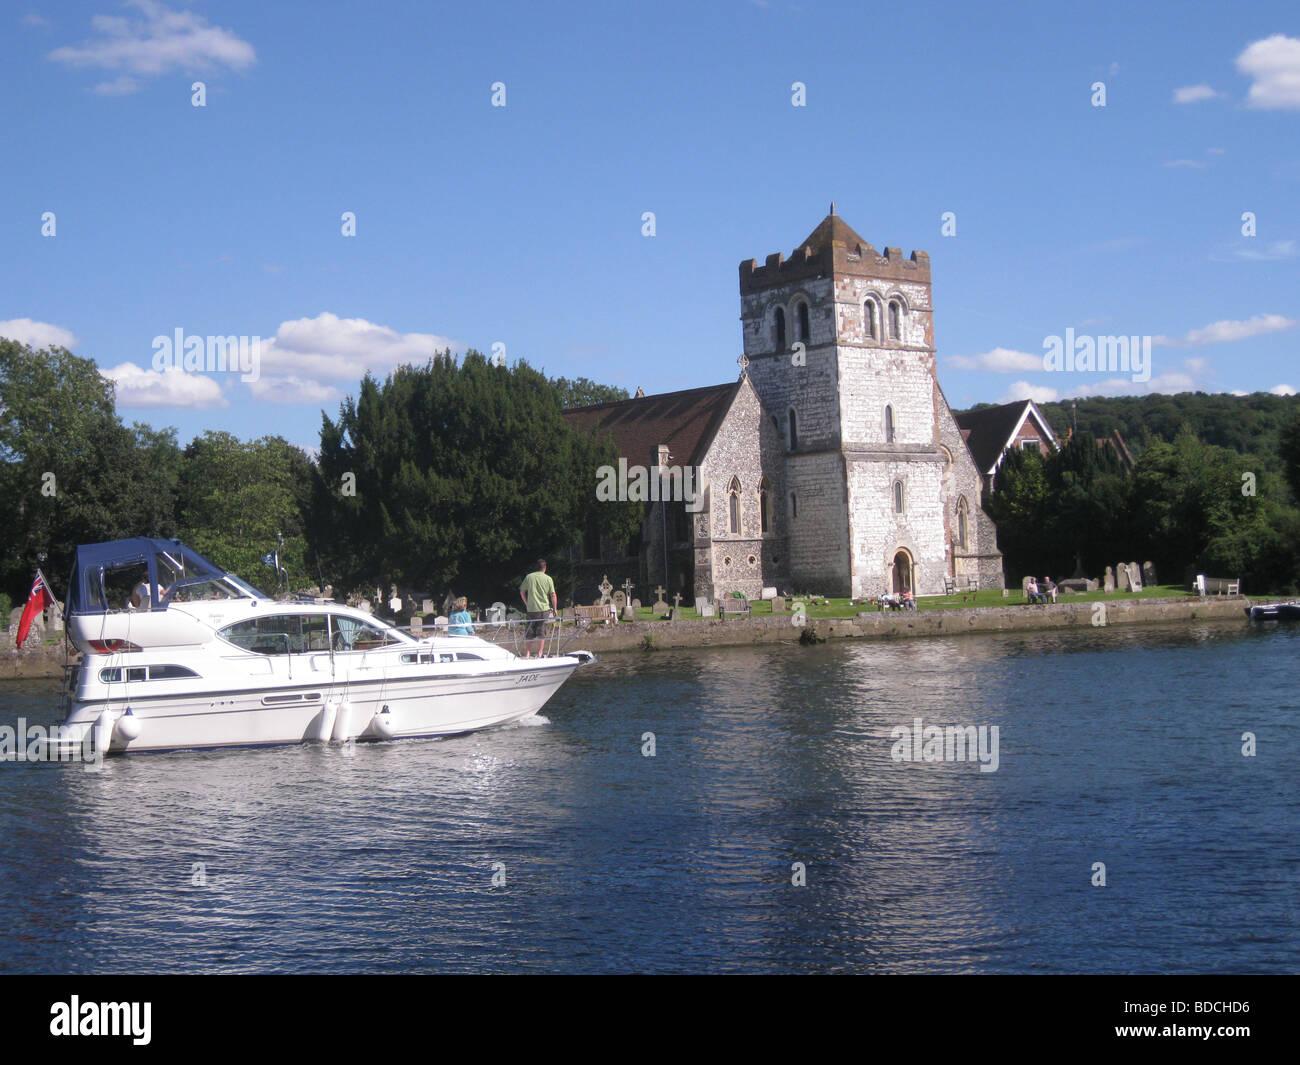 ALL SAINTS CHURCH, Bisham, beside the Thames near Henley-on-Thames, England - Stock Image